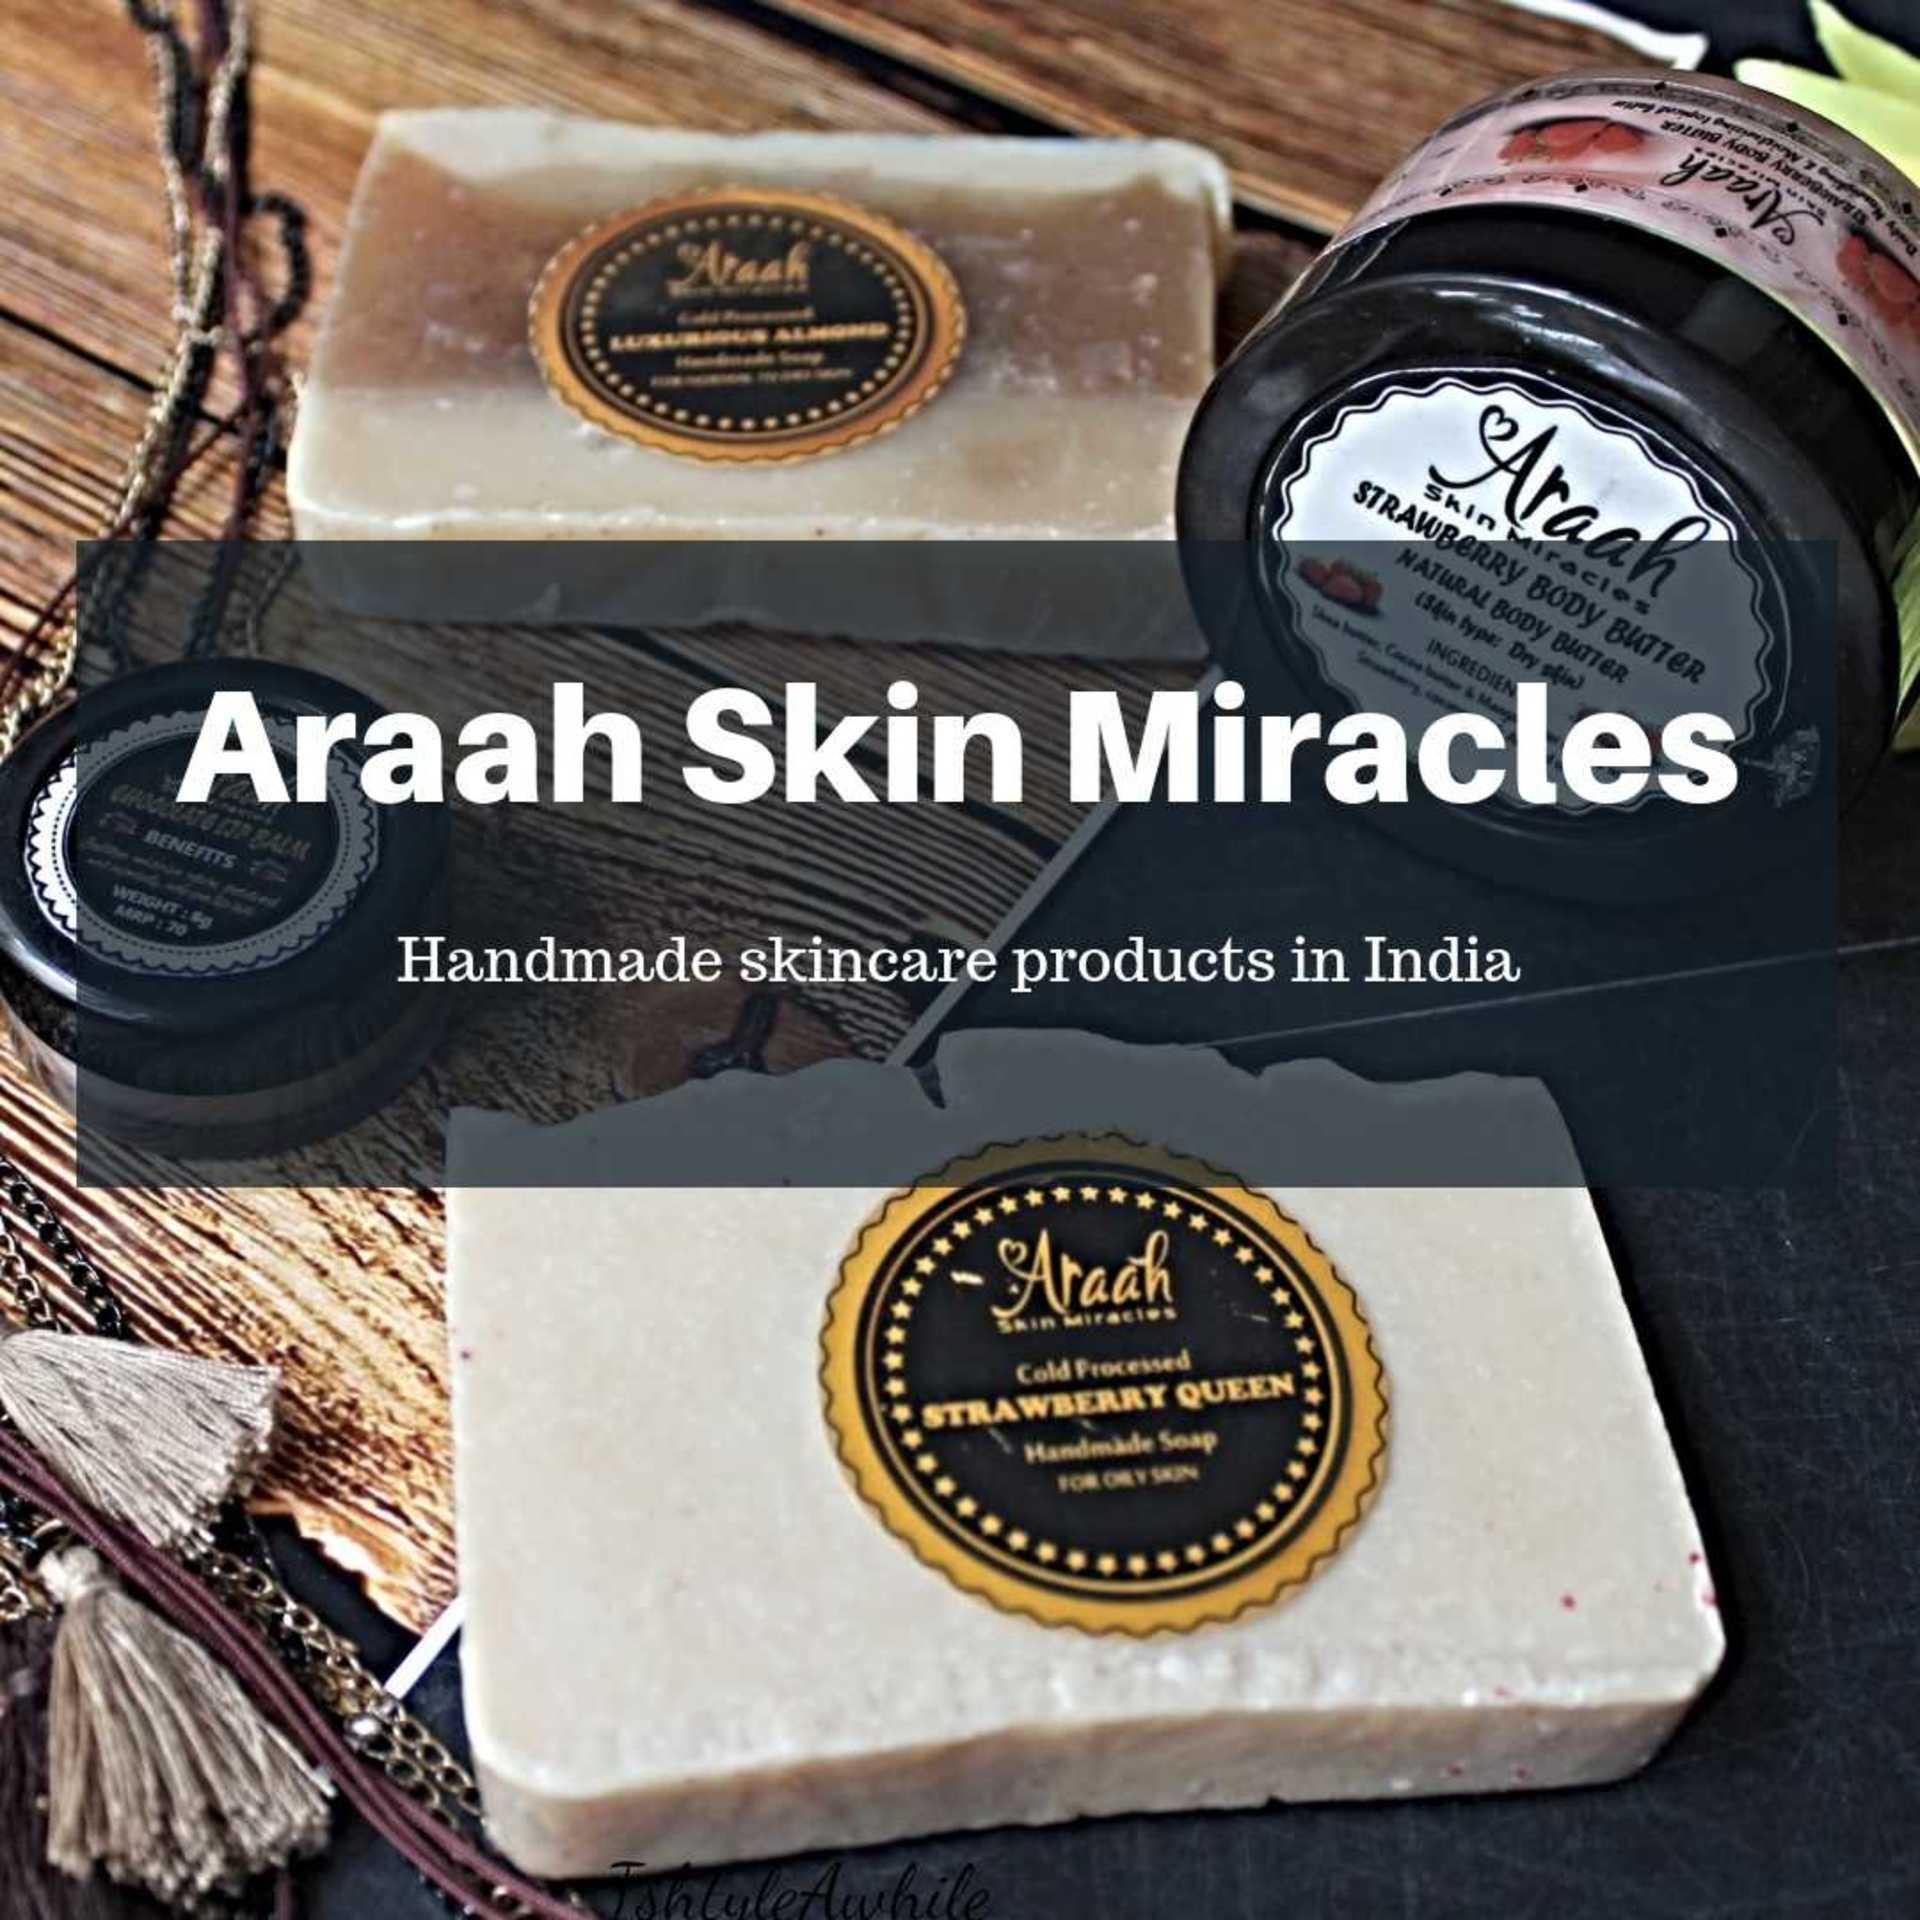 Handmade skincare brand: Araah Skin Miracles image